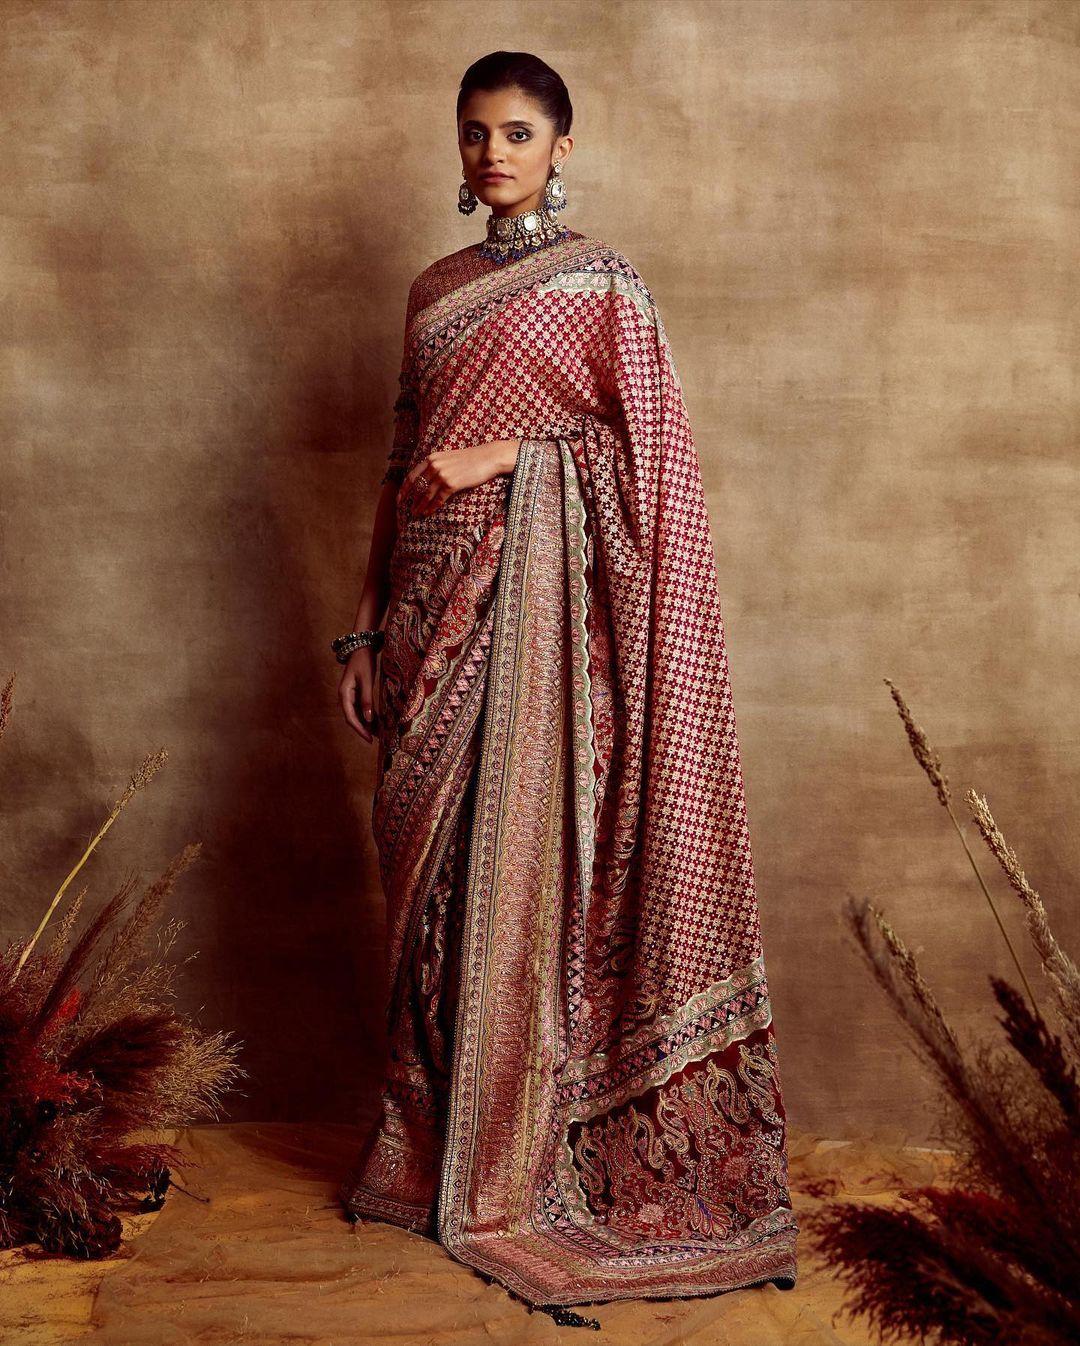 zardosi detailed saree